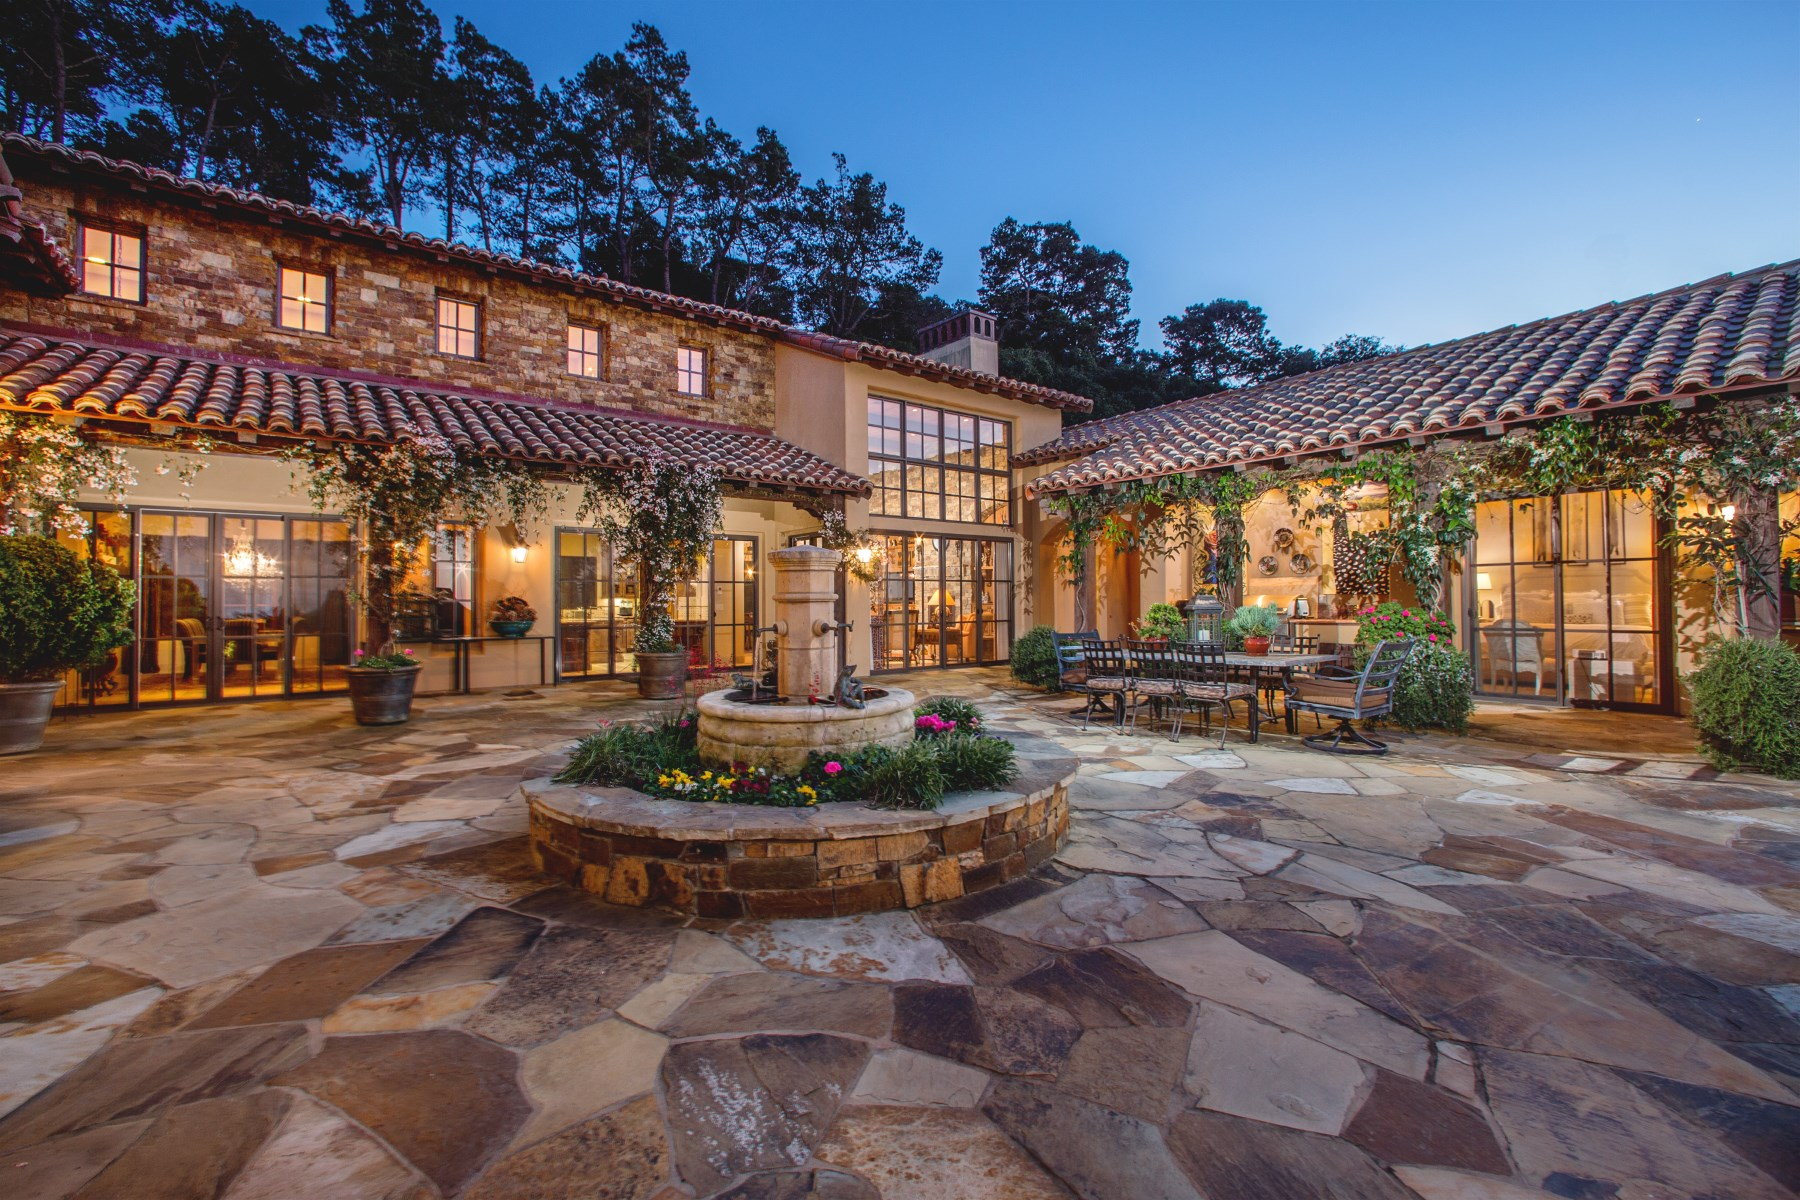 Single Family Home for Sale at Sophisticated California Hacienda - 7591 Paseo Vista Monterey, California, 93940 United States